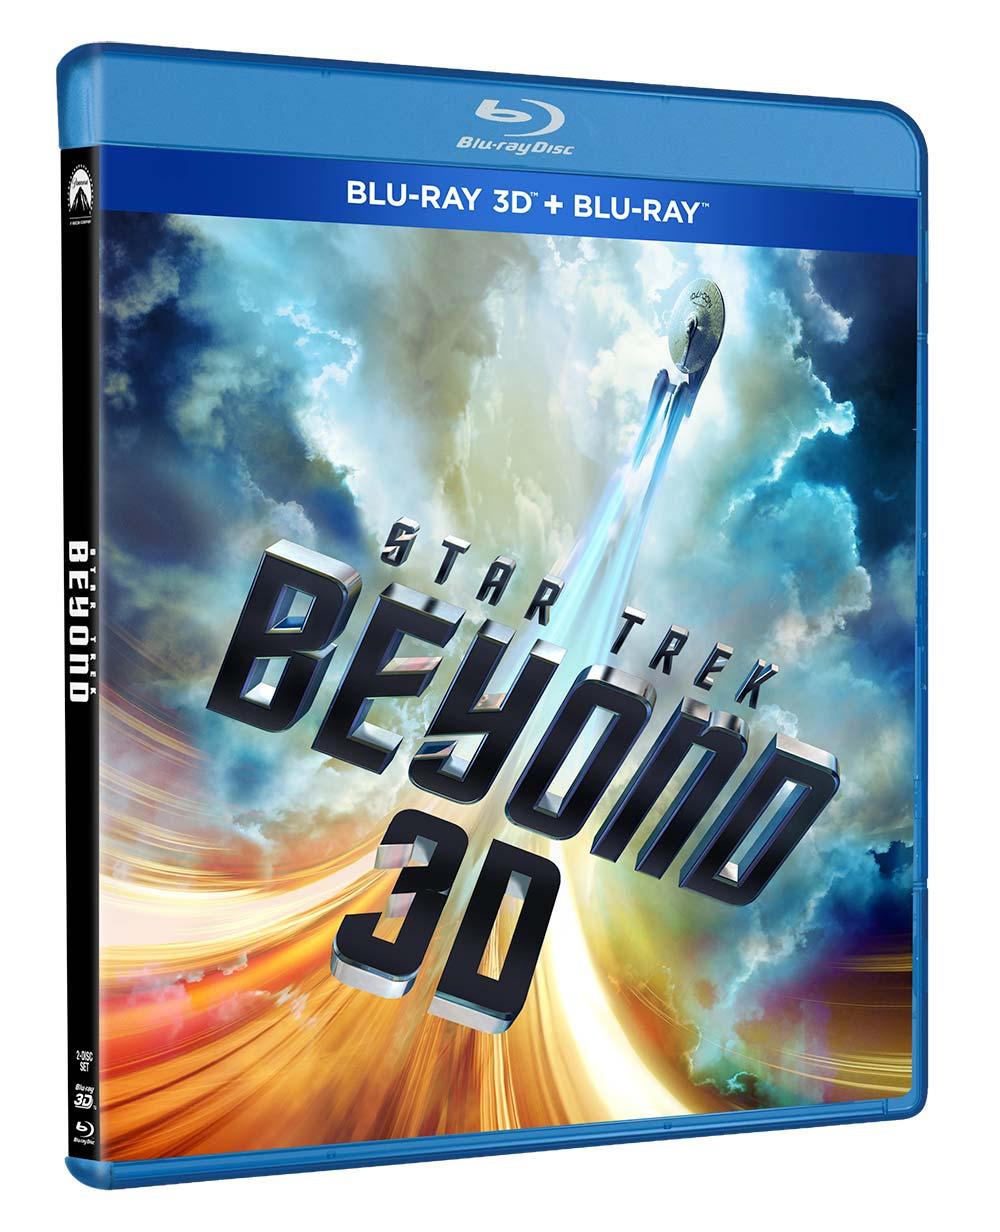 STAR TREK - BEYOND (3D) (BLU-RAY 3D+BLU-RAY)